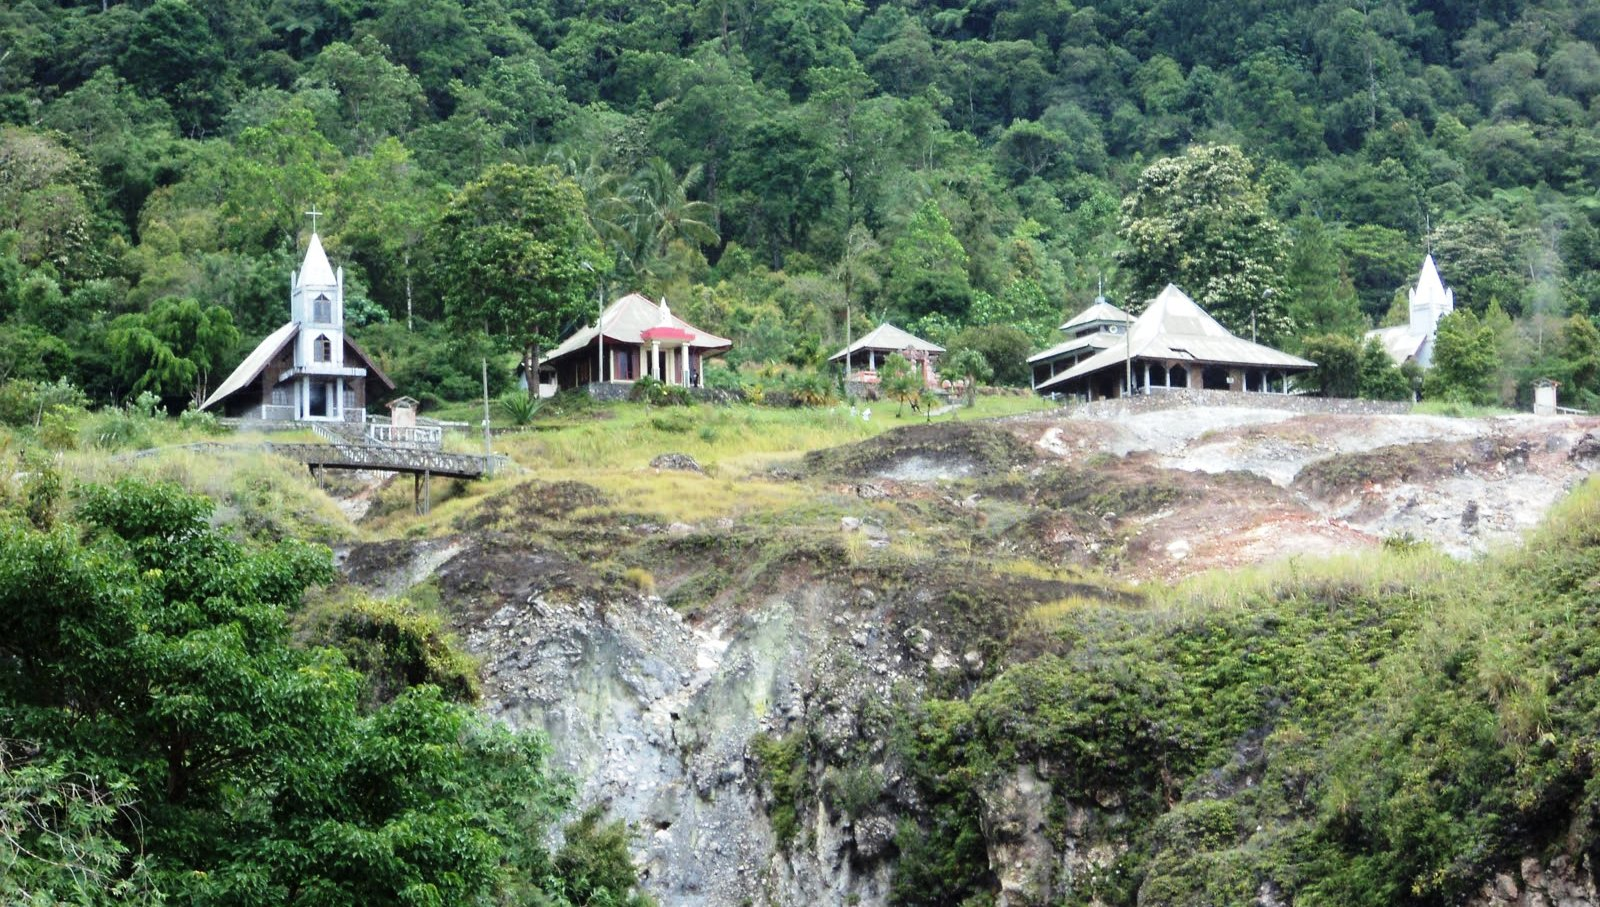 Bukit Kasih, Keindahan Alam dari Puncak Bukit - Sulawesi Utara